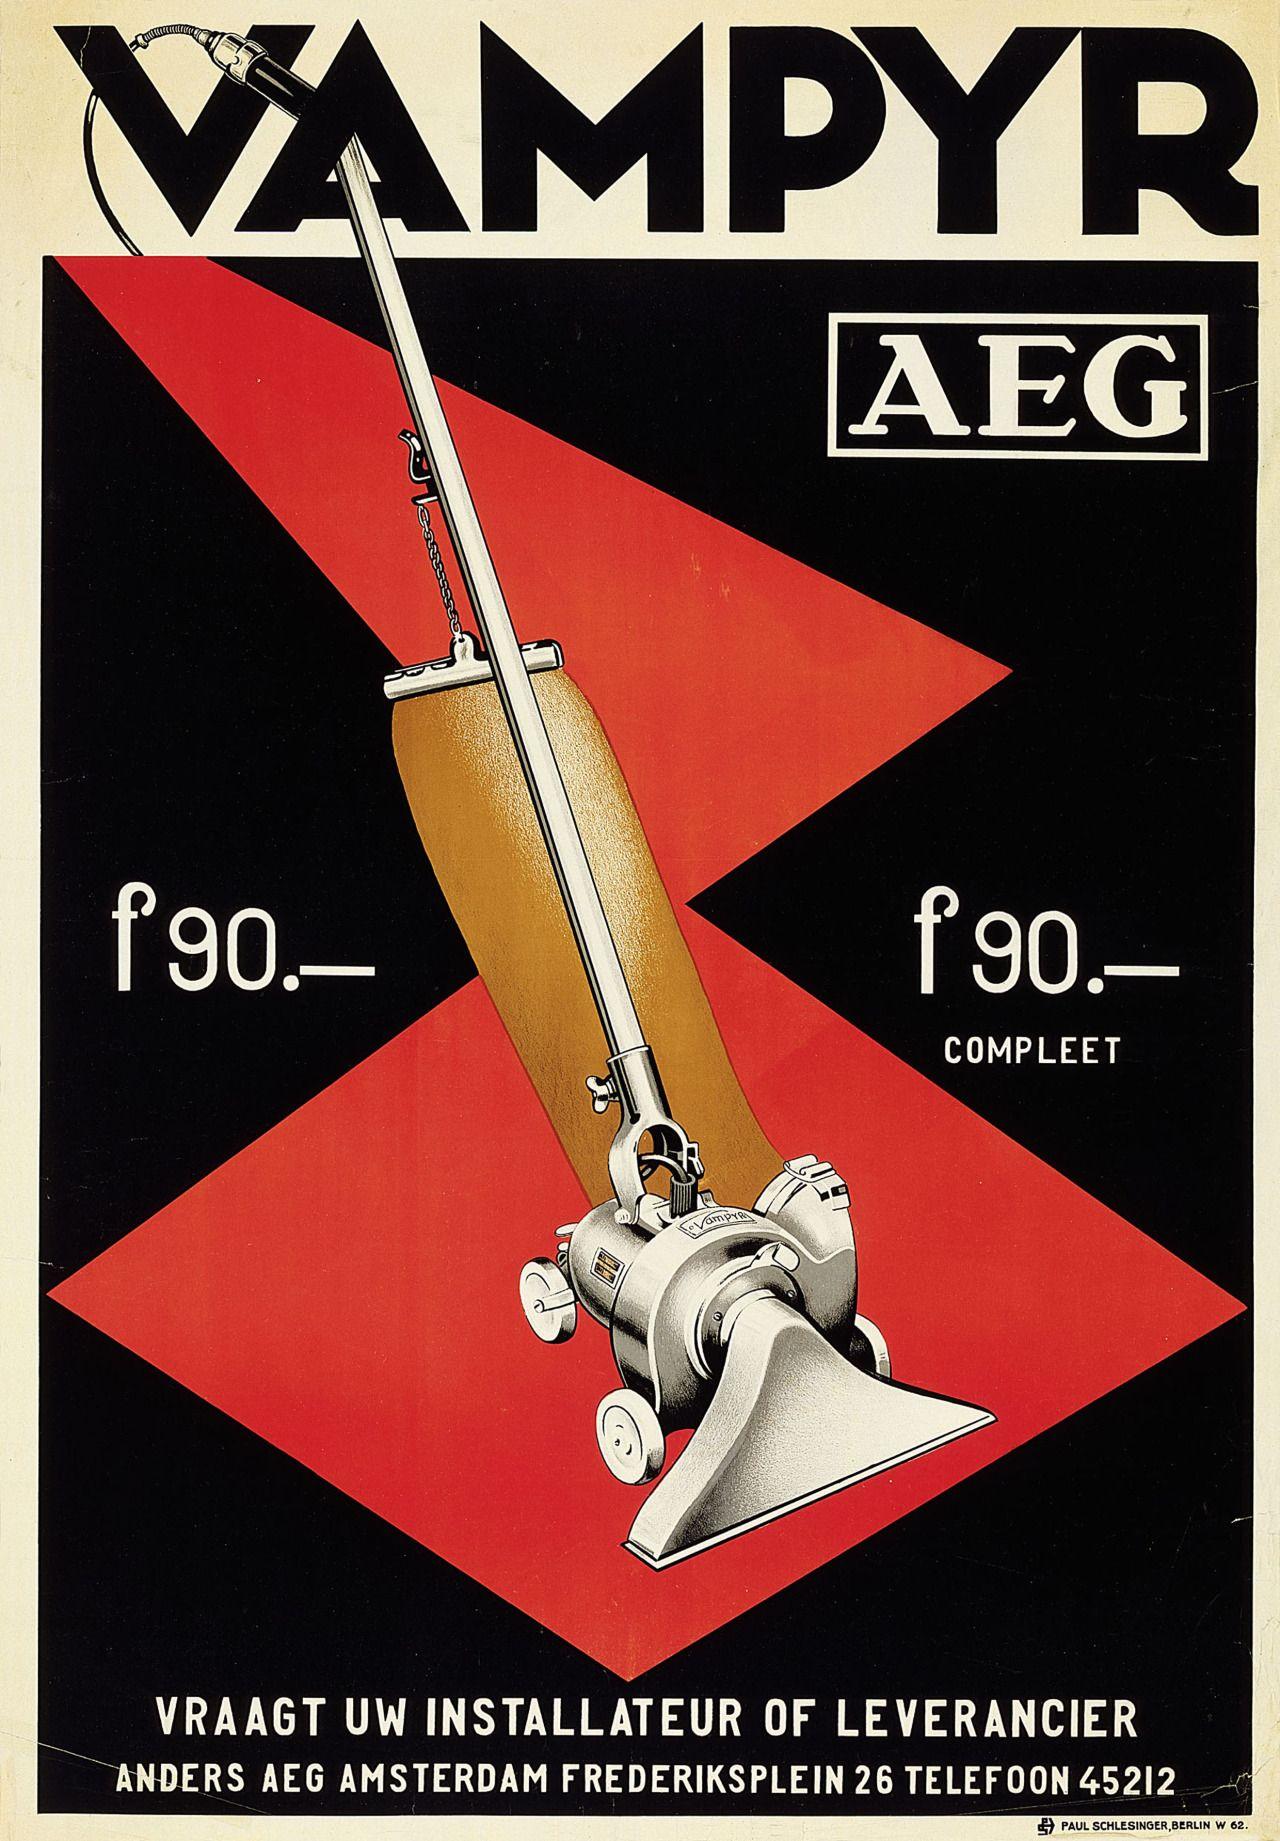 Poster design 1920s - Design Is Fine History Is Mine Aeg Poster For Vampyr Vacuum Cleaner